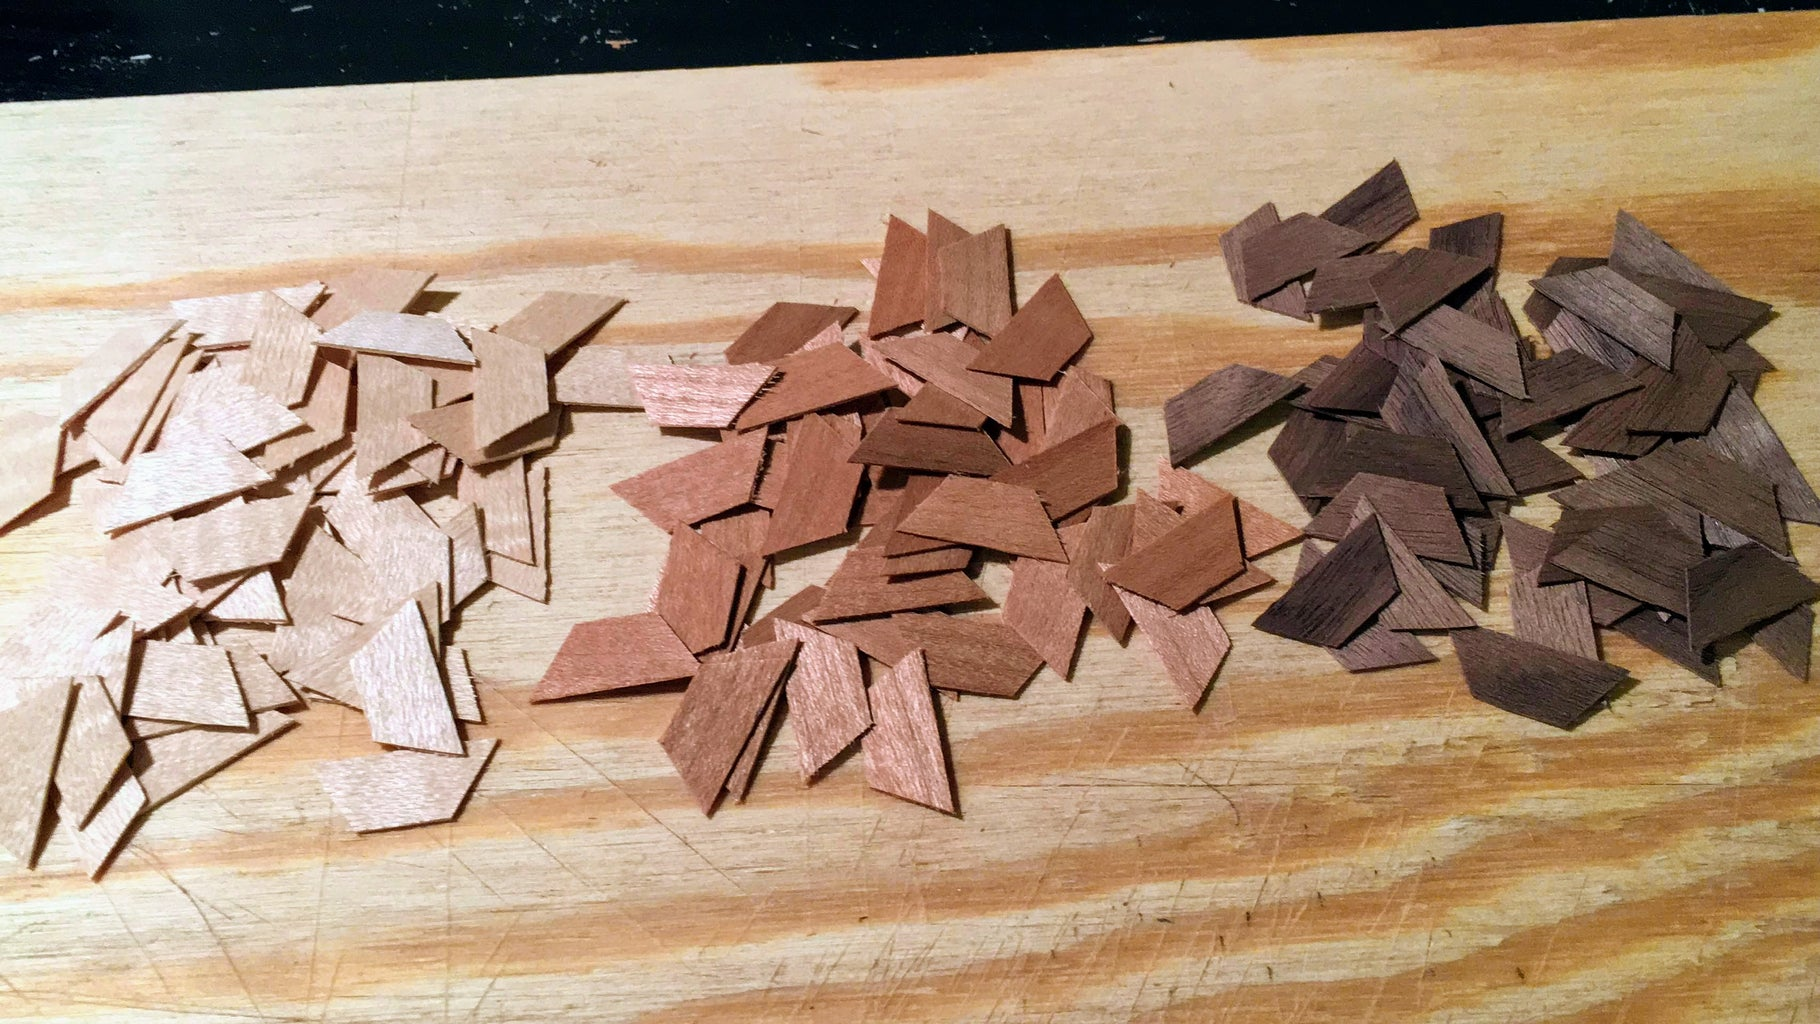 Cutting the Trapezoids